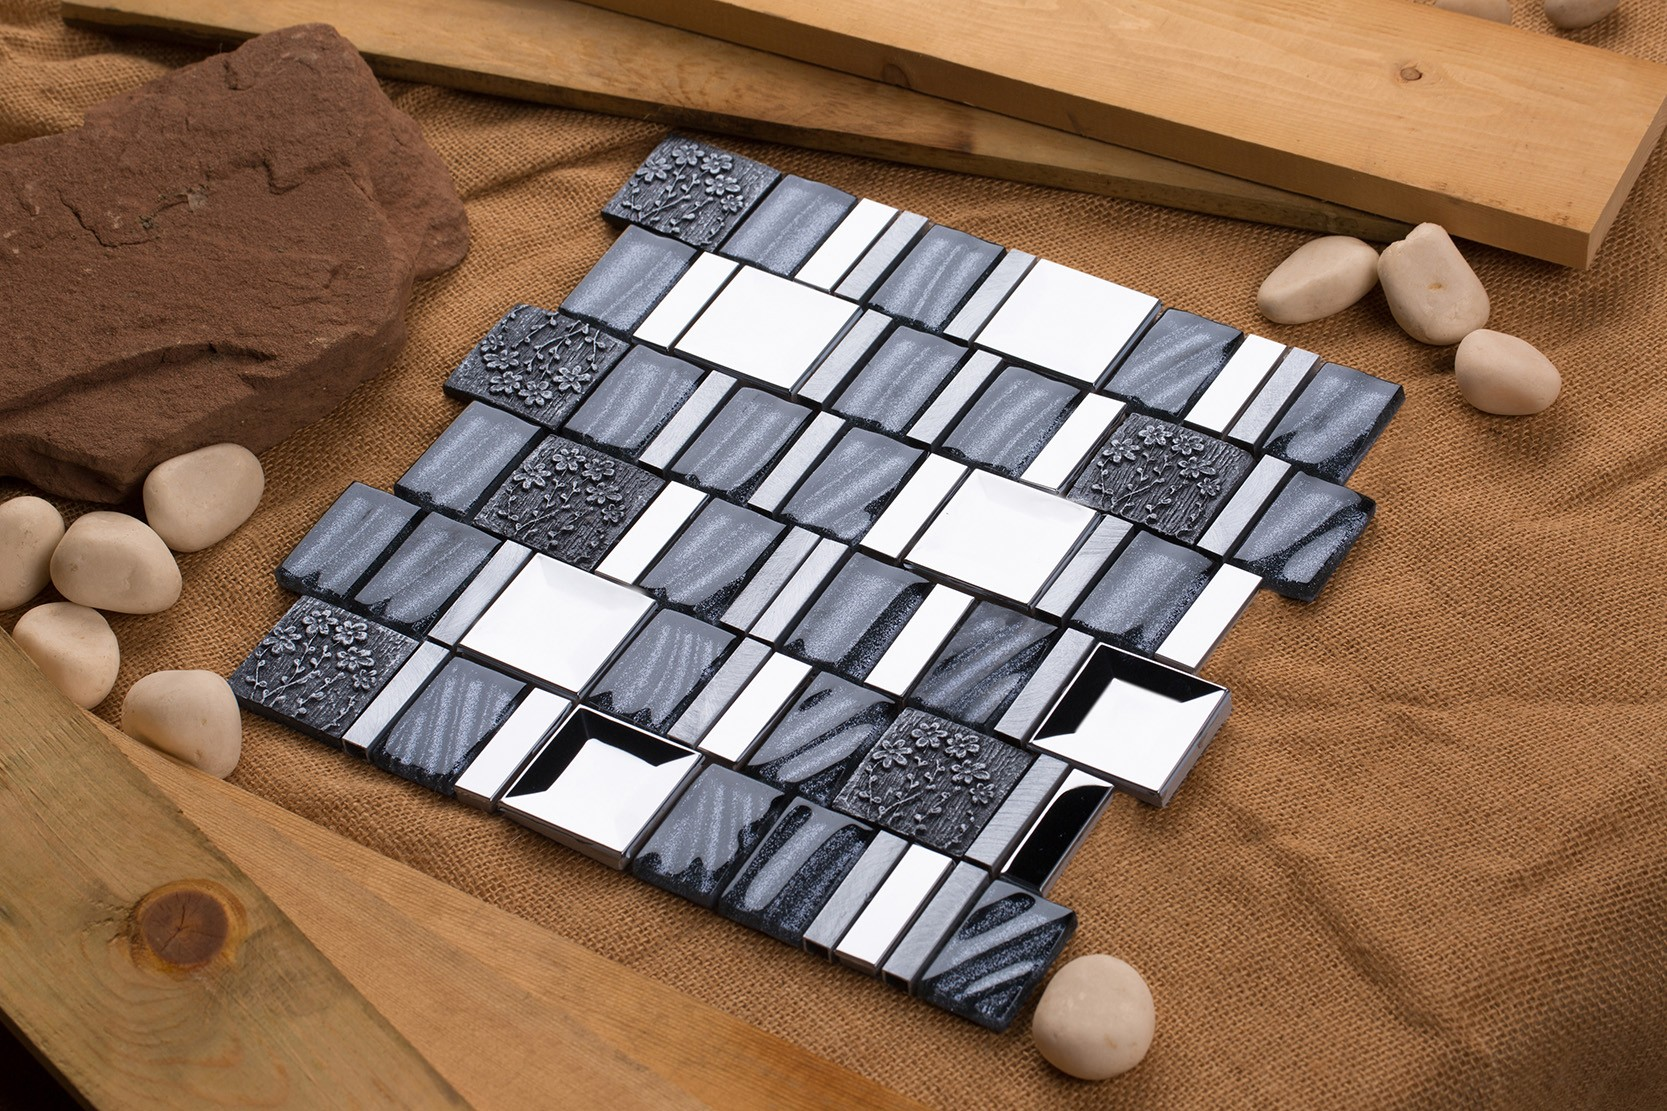 Mirrella Vitray Stainless Steel Hand Painted Ceramics Aluminum - 12x12 painted ceramic tile